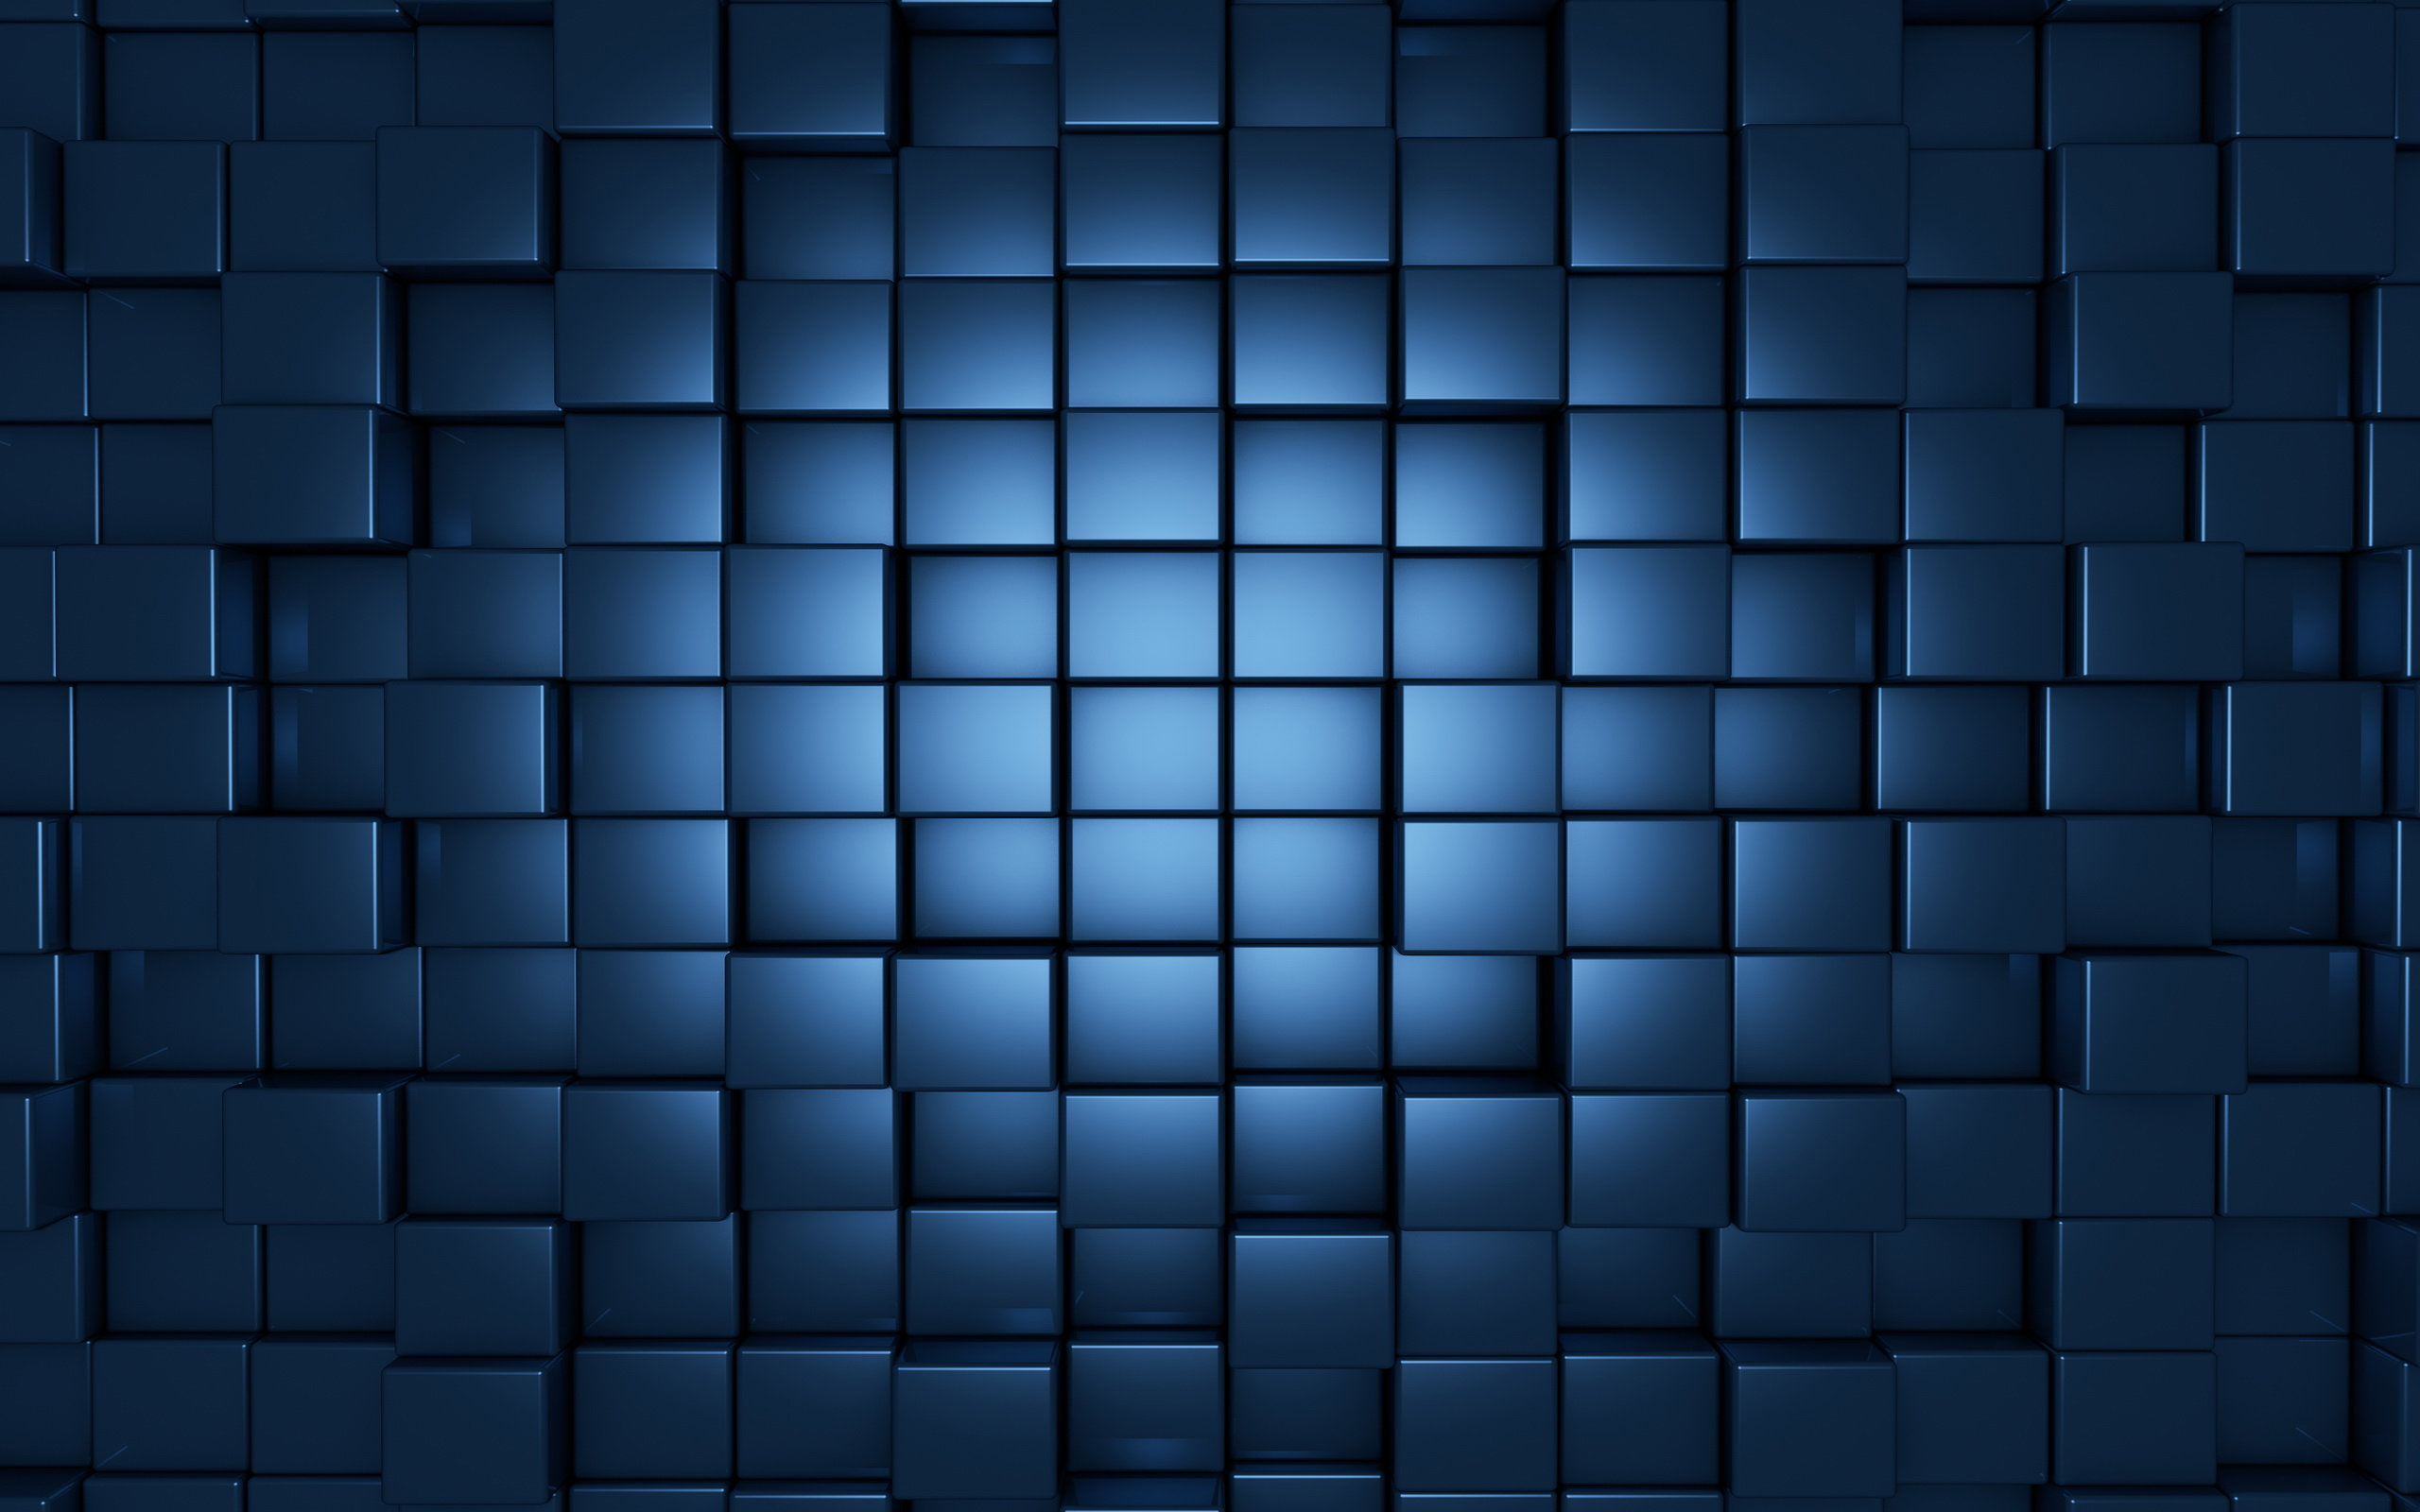 cube computer wallpapers desktop - photo #7